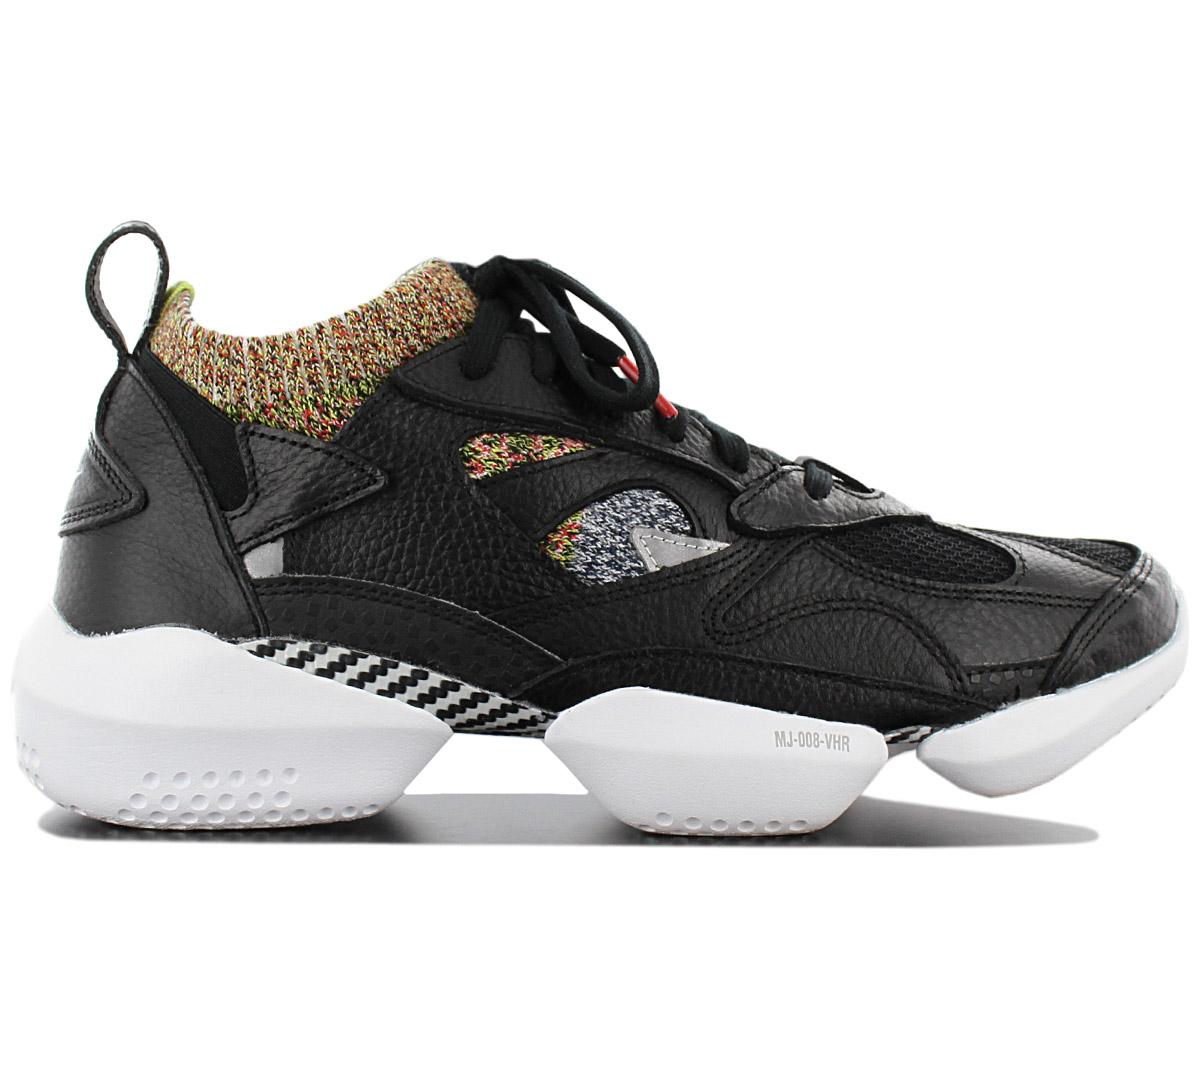 Details about Reebok 3D OP. Pro Mens HighTech Sneaker CN3956 Shoes Sneakers Opus NEW show original title